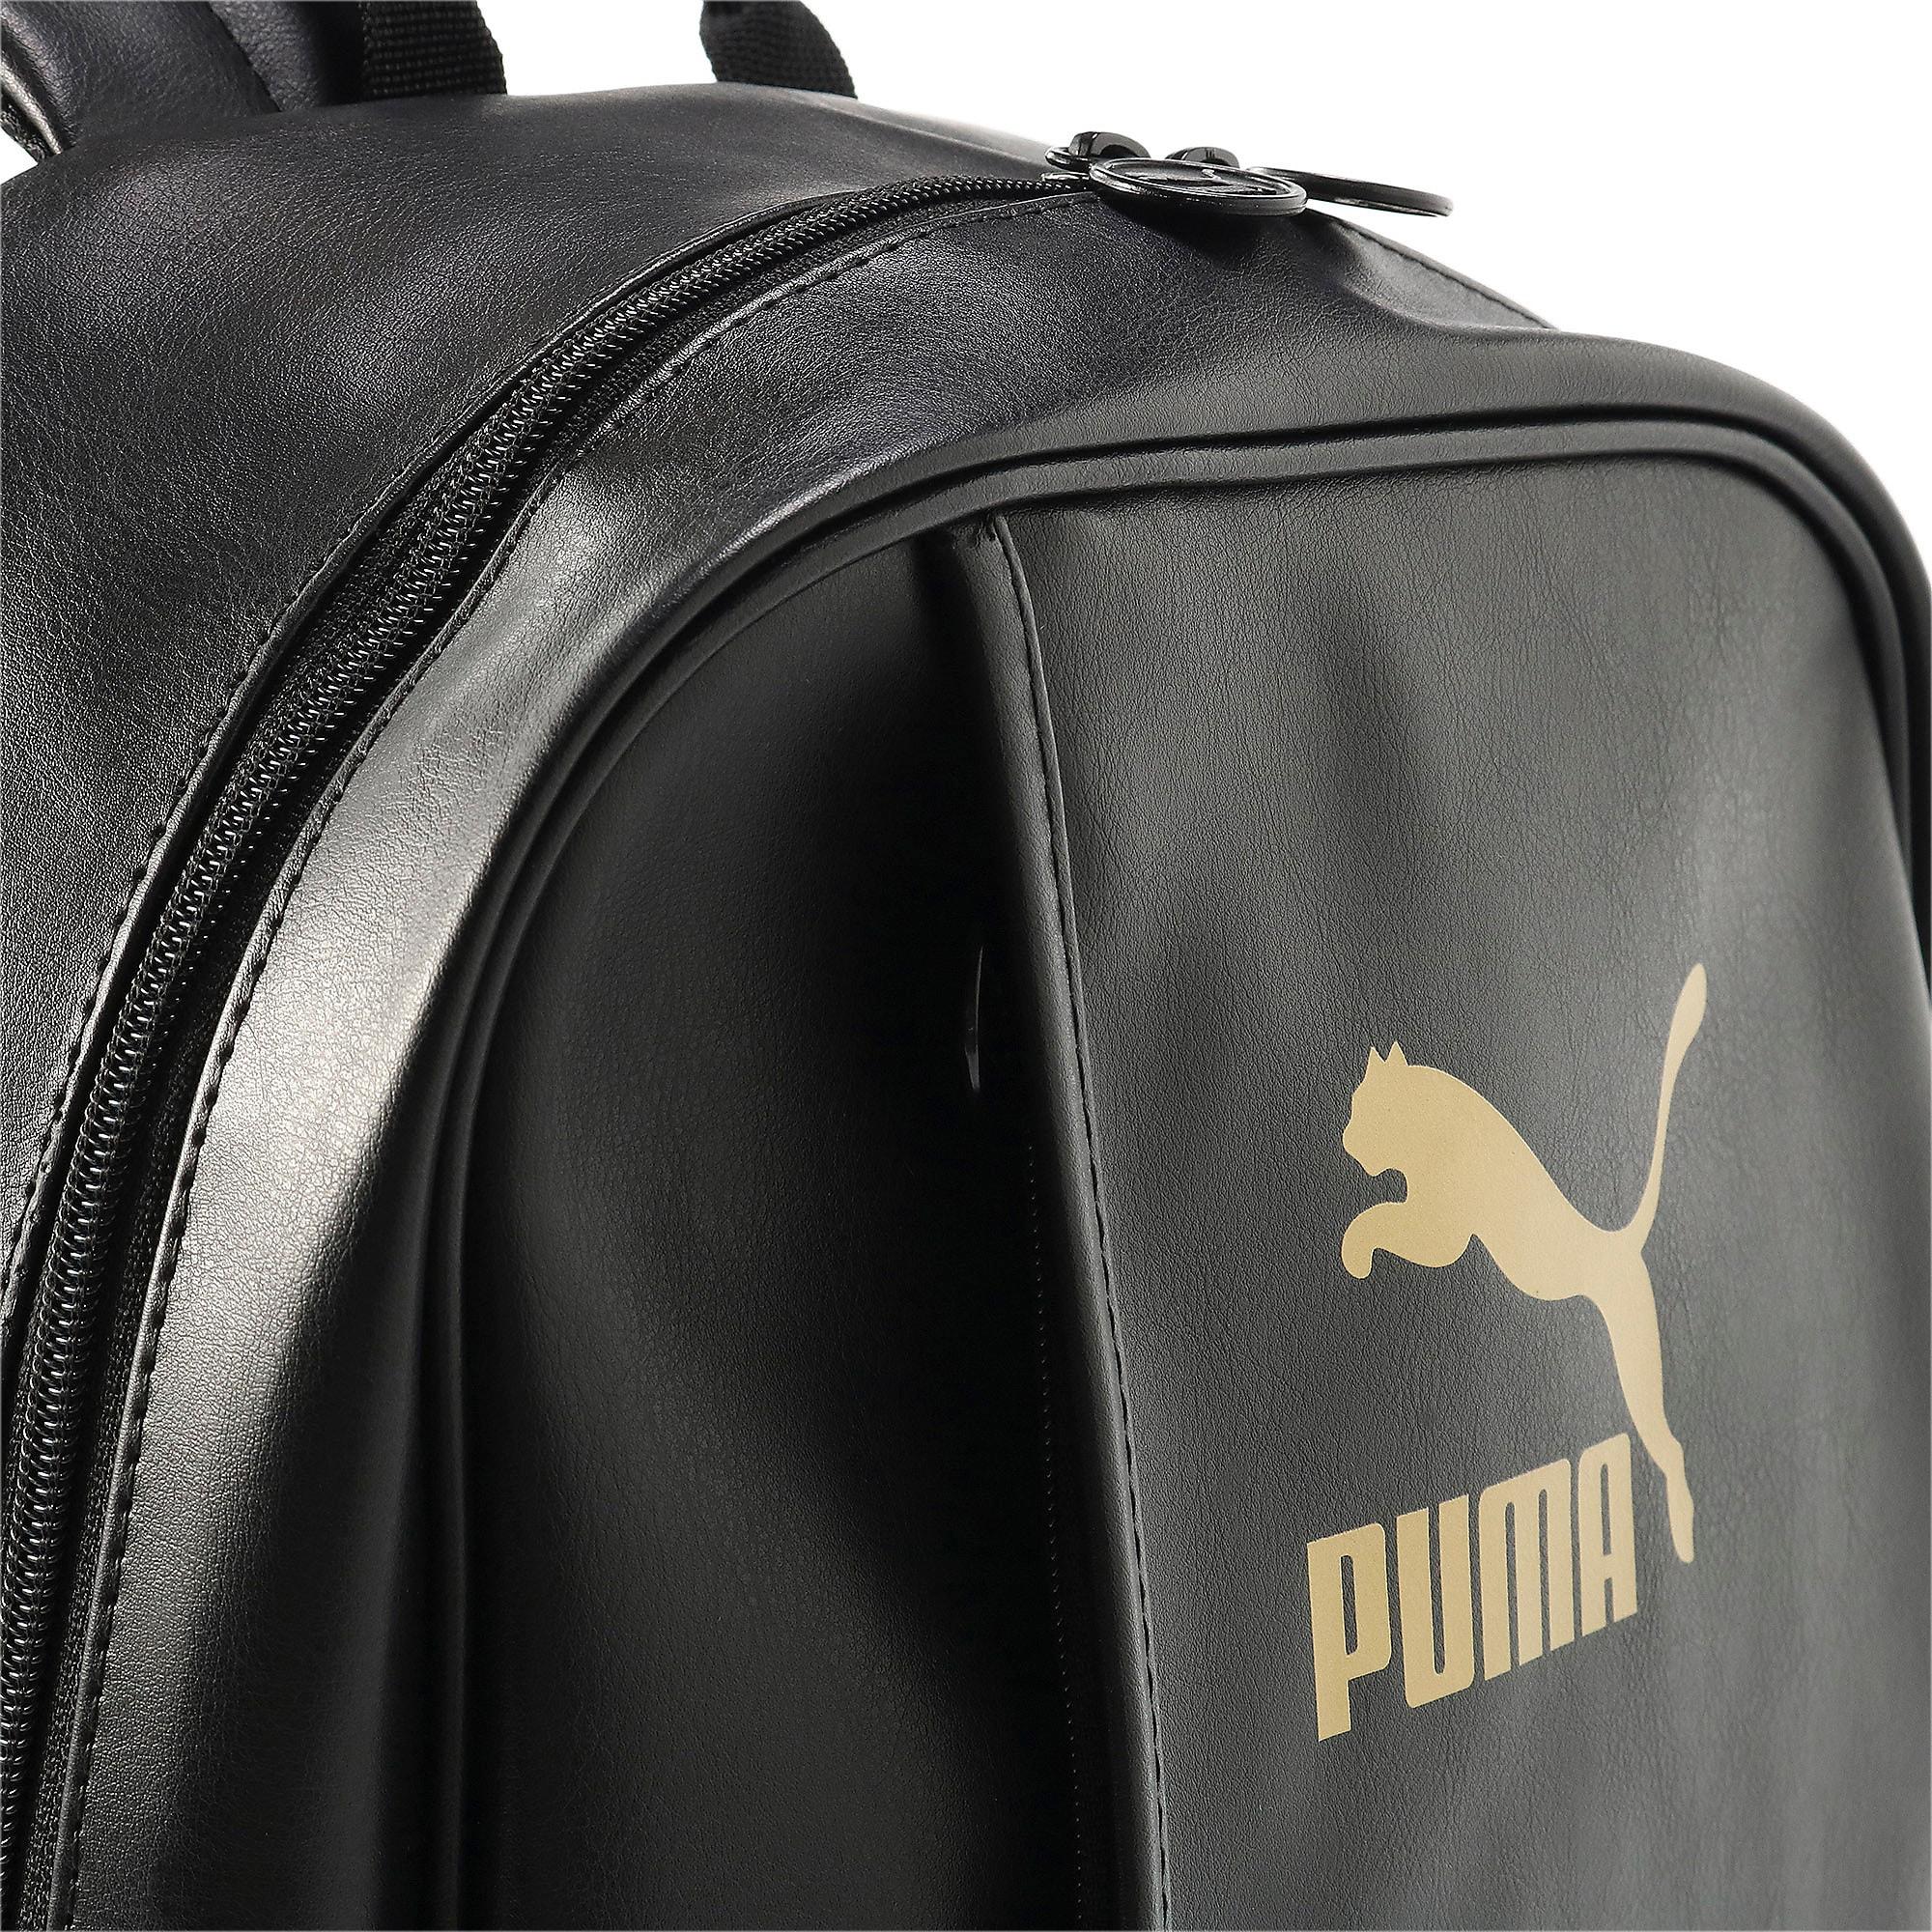 Thumbnail 7 of オリジナルス バックパック レトロ PU (23L), Puma Black, medium-JPN